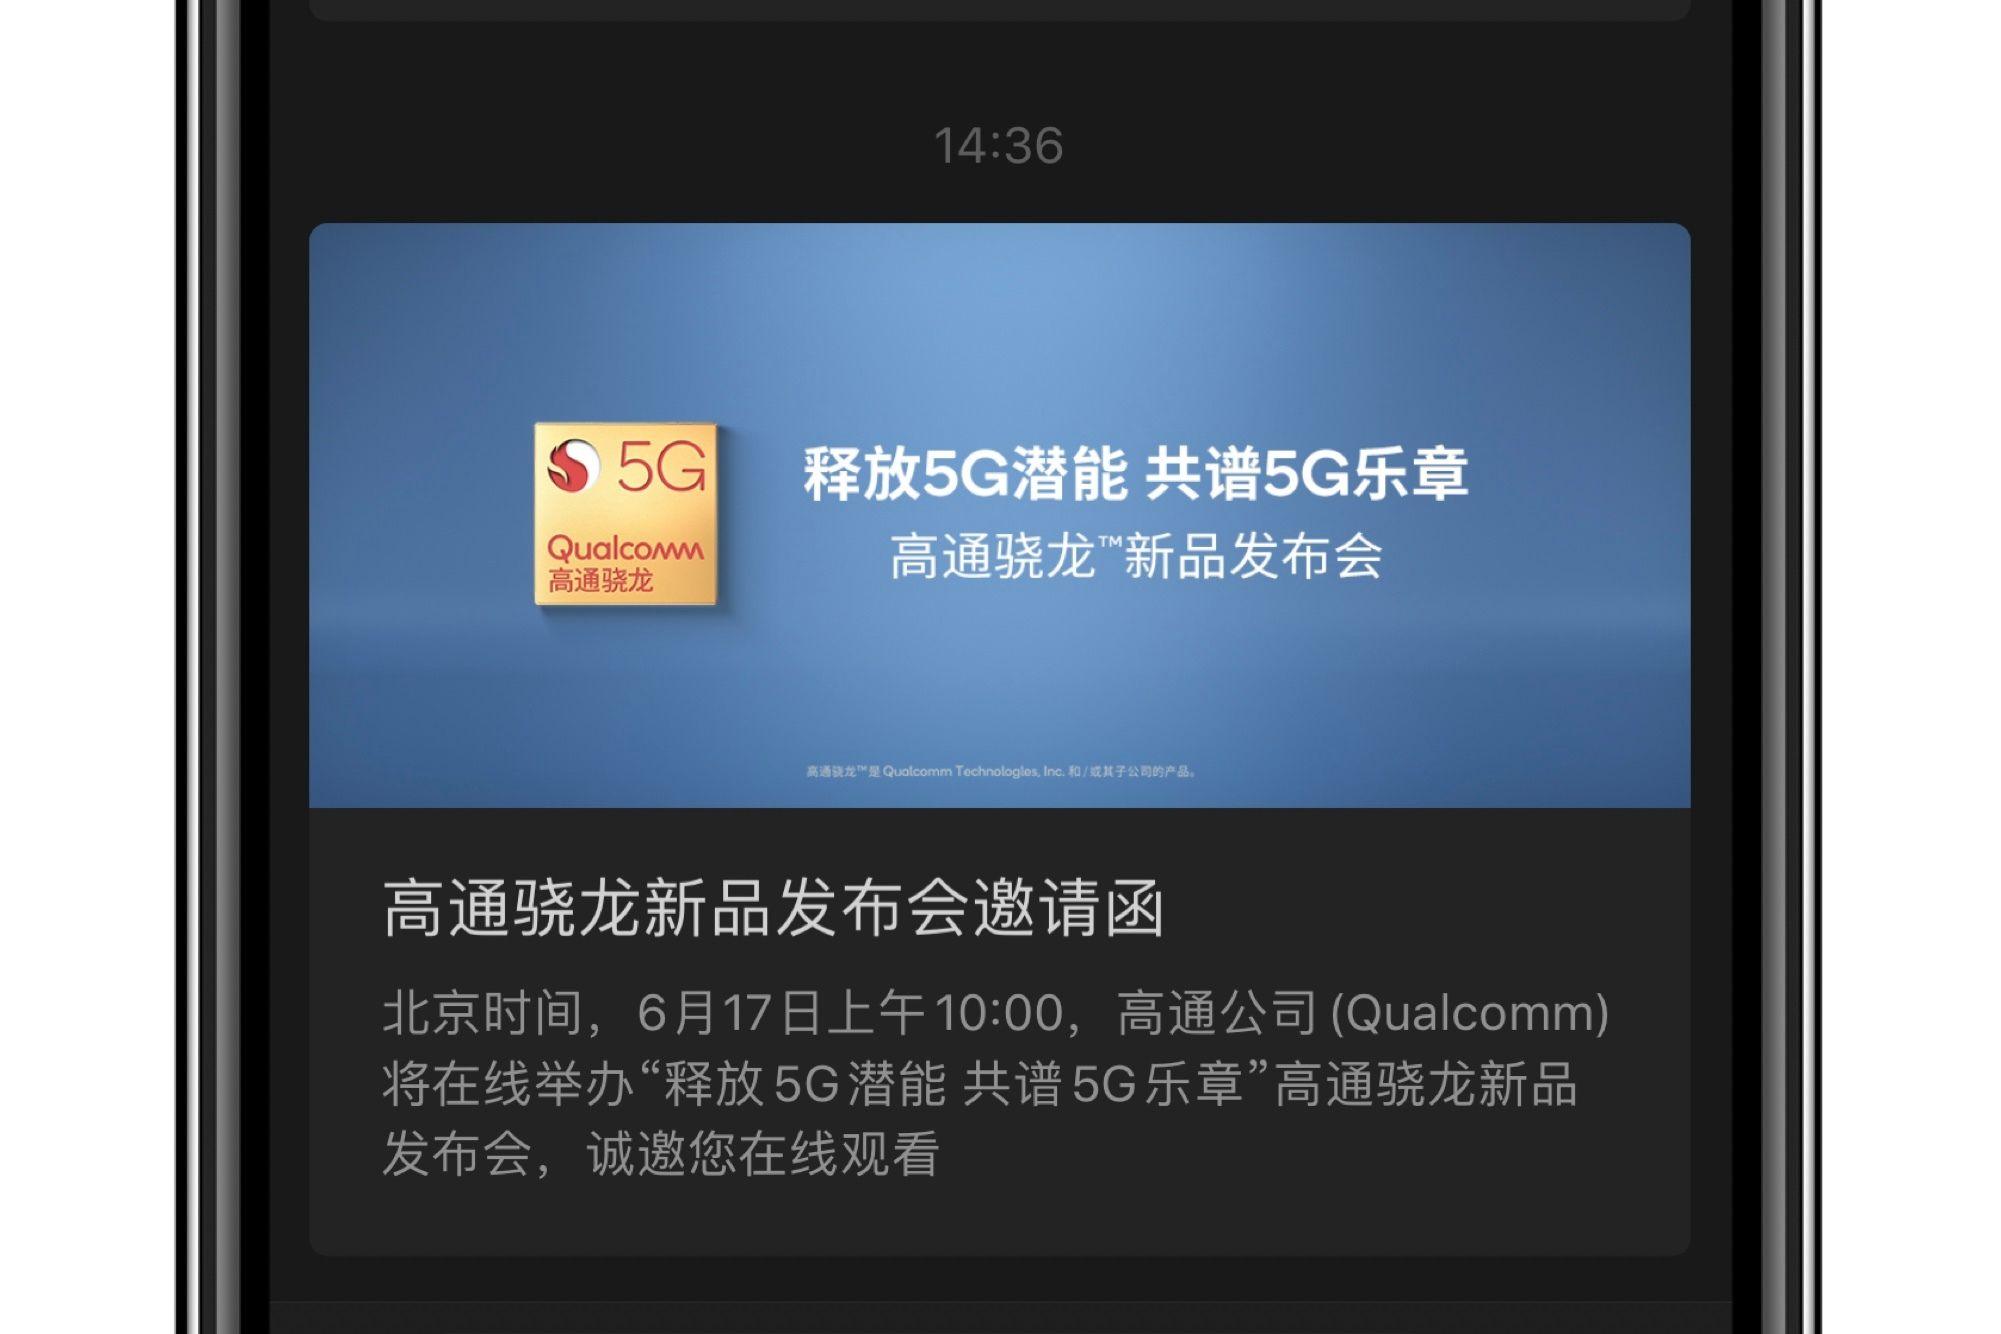 Qualcommが6月17日に新製品発表会を開催、5G通信対応SoCを発表予定